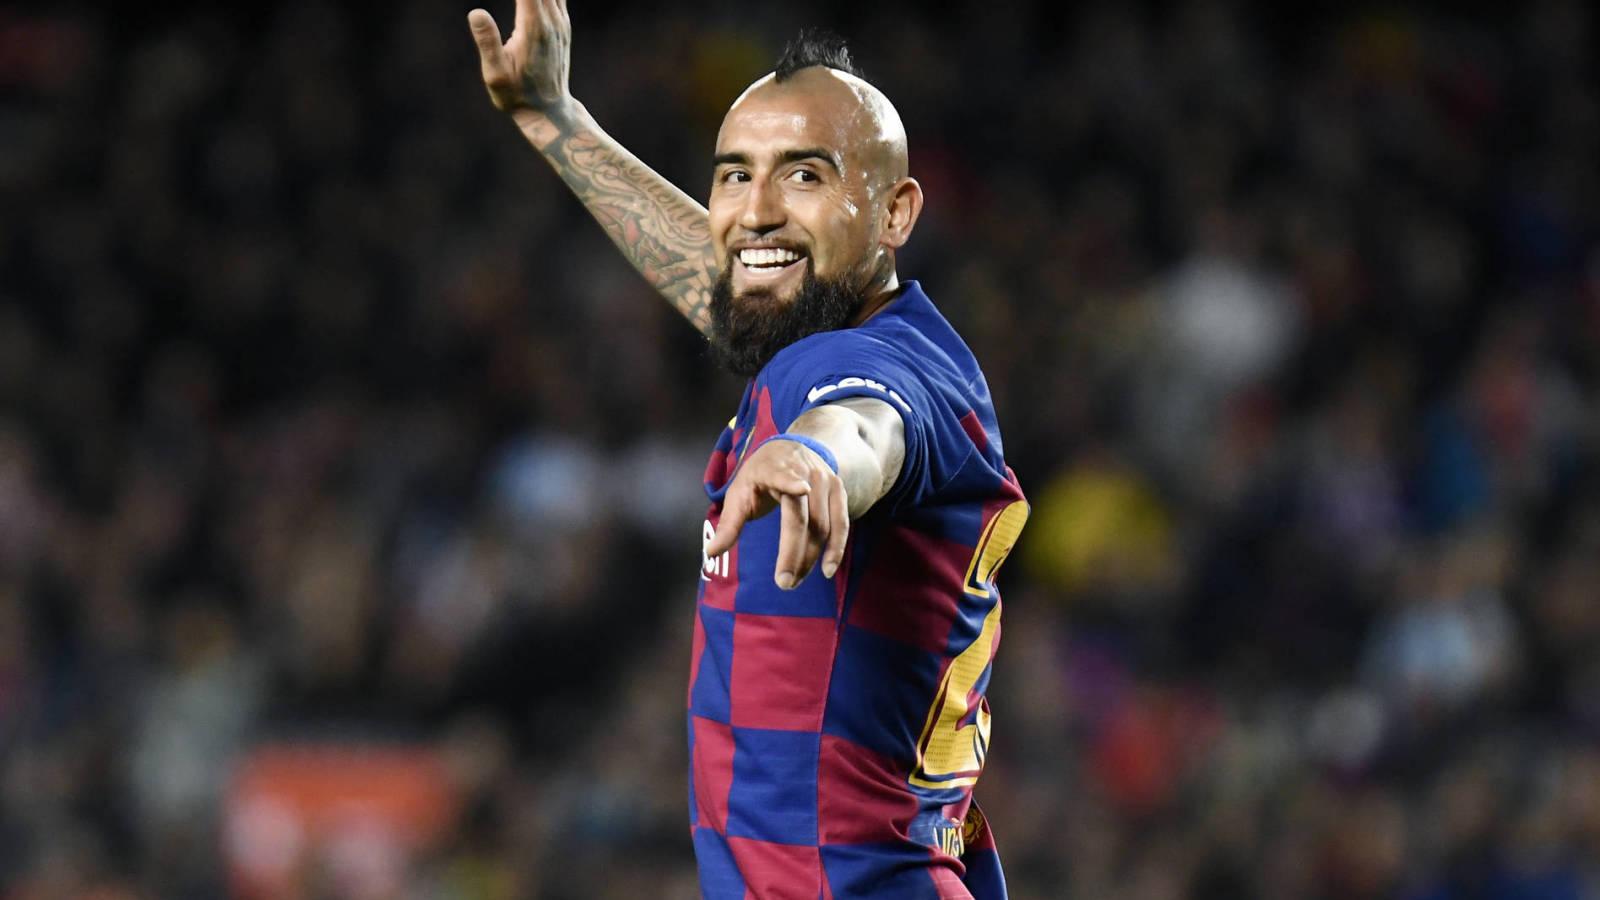 Report: Barcelona must sell players due to coronavirus pandemic